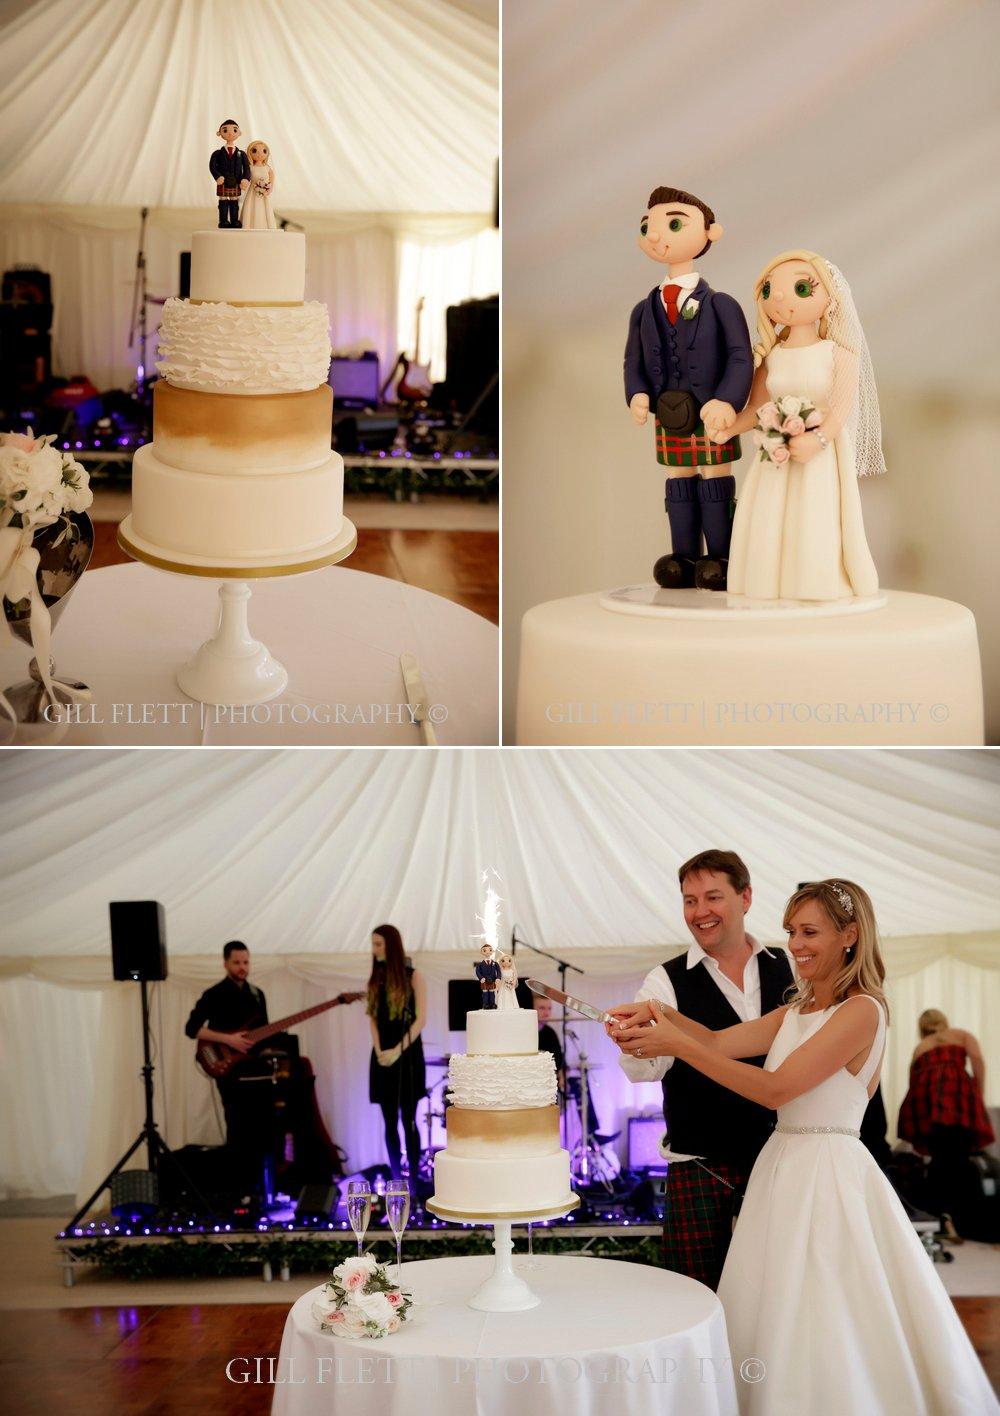 cake-cutting-ham-house-gillflett-photo.jpg